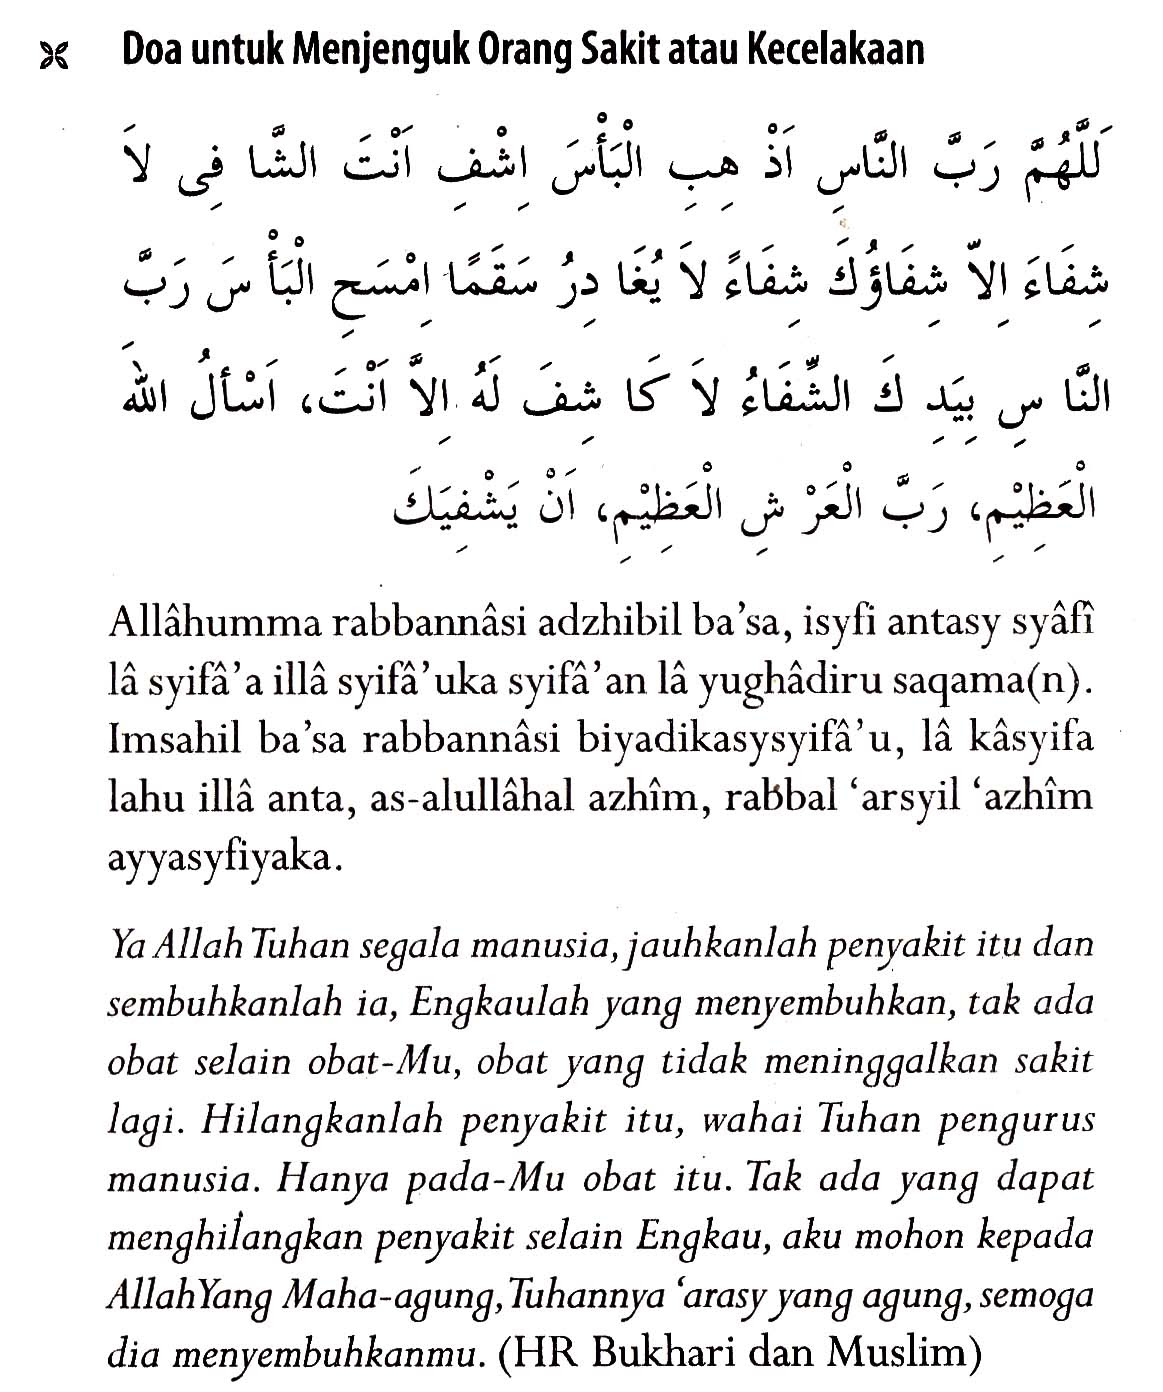 http://ppdarulhikmahsby.files.wordpress.com/2013/12/doa-menjenguk-orang-sakit.jpg